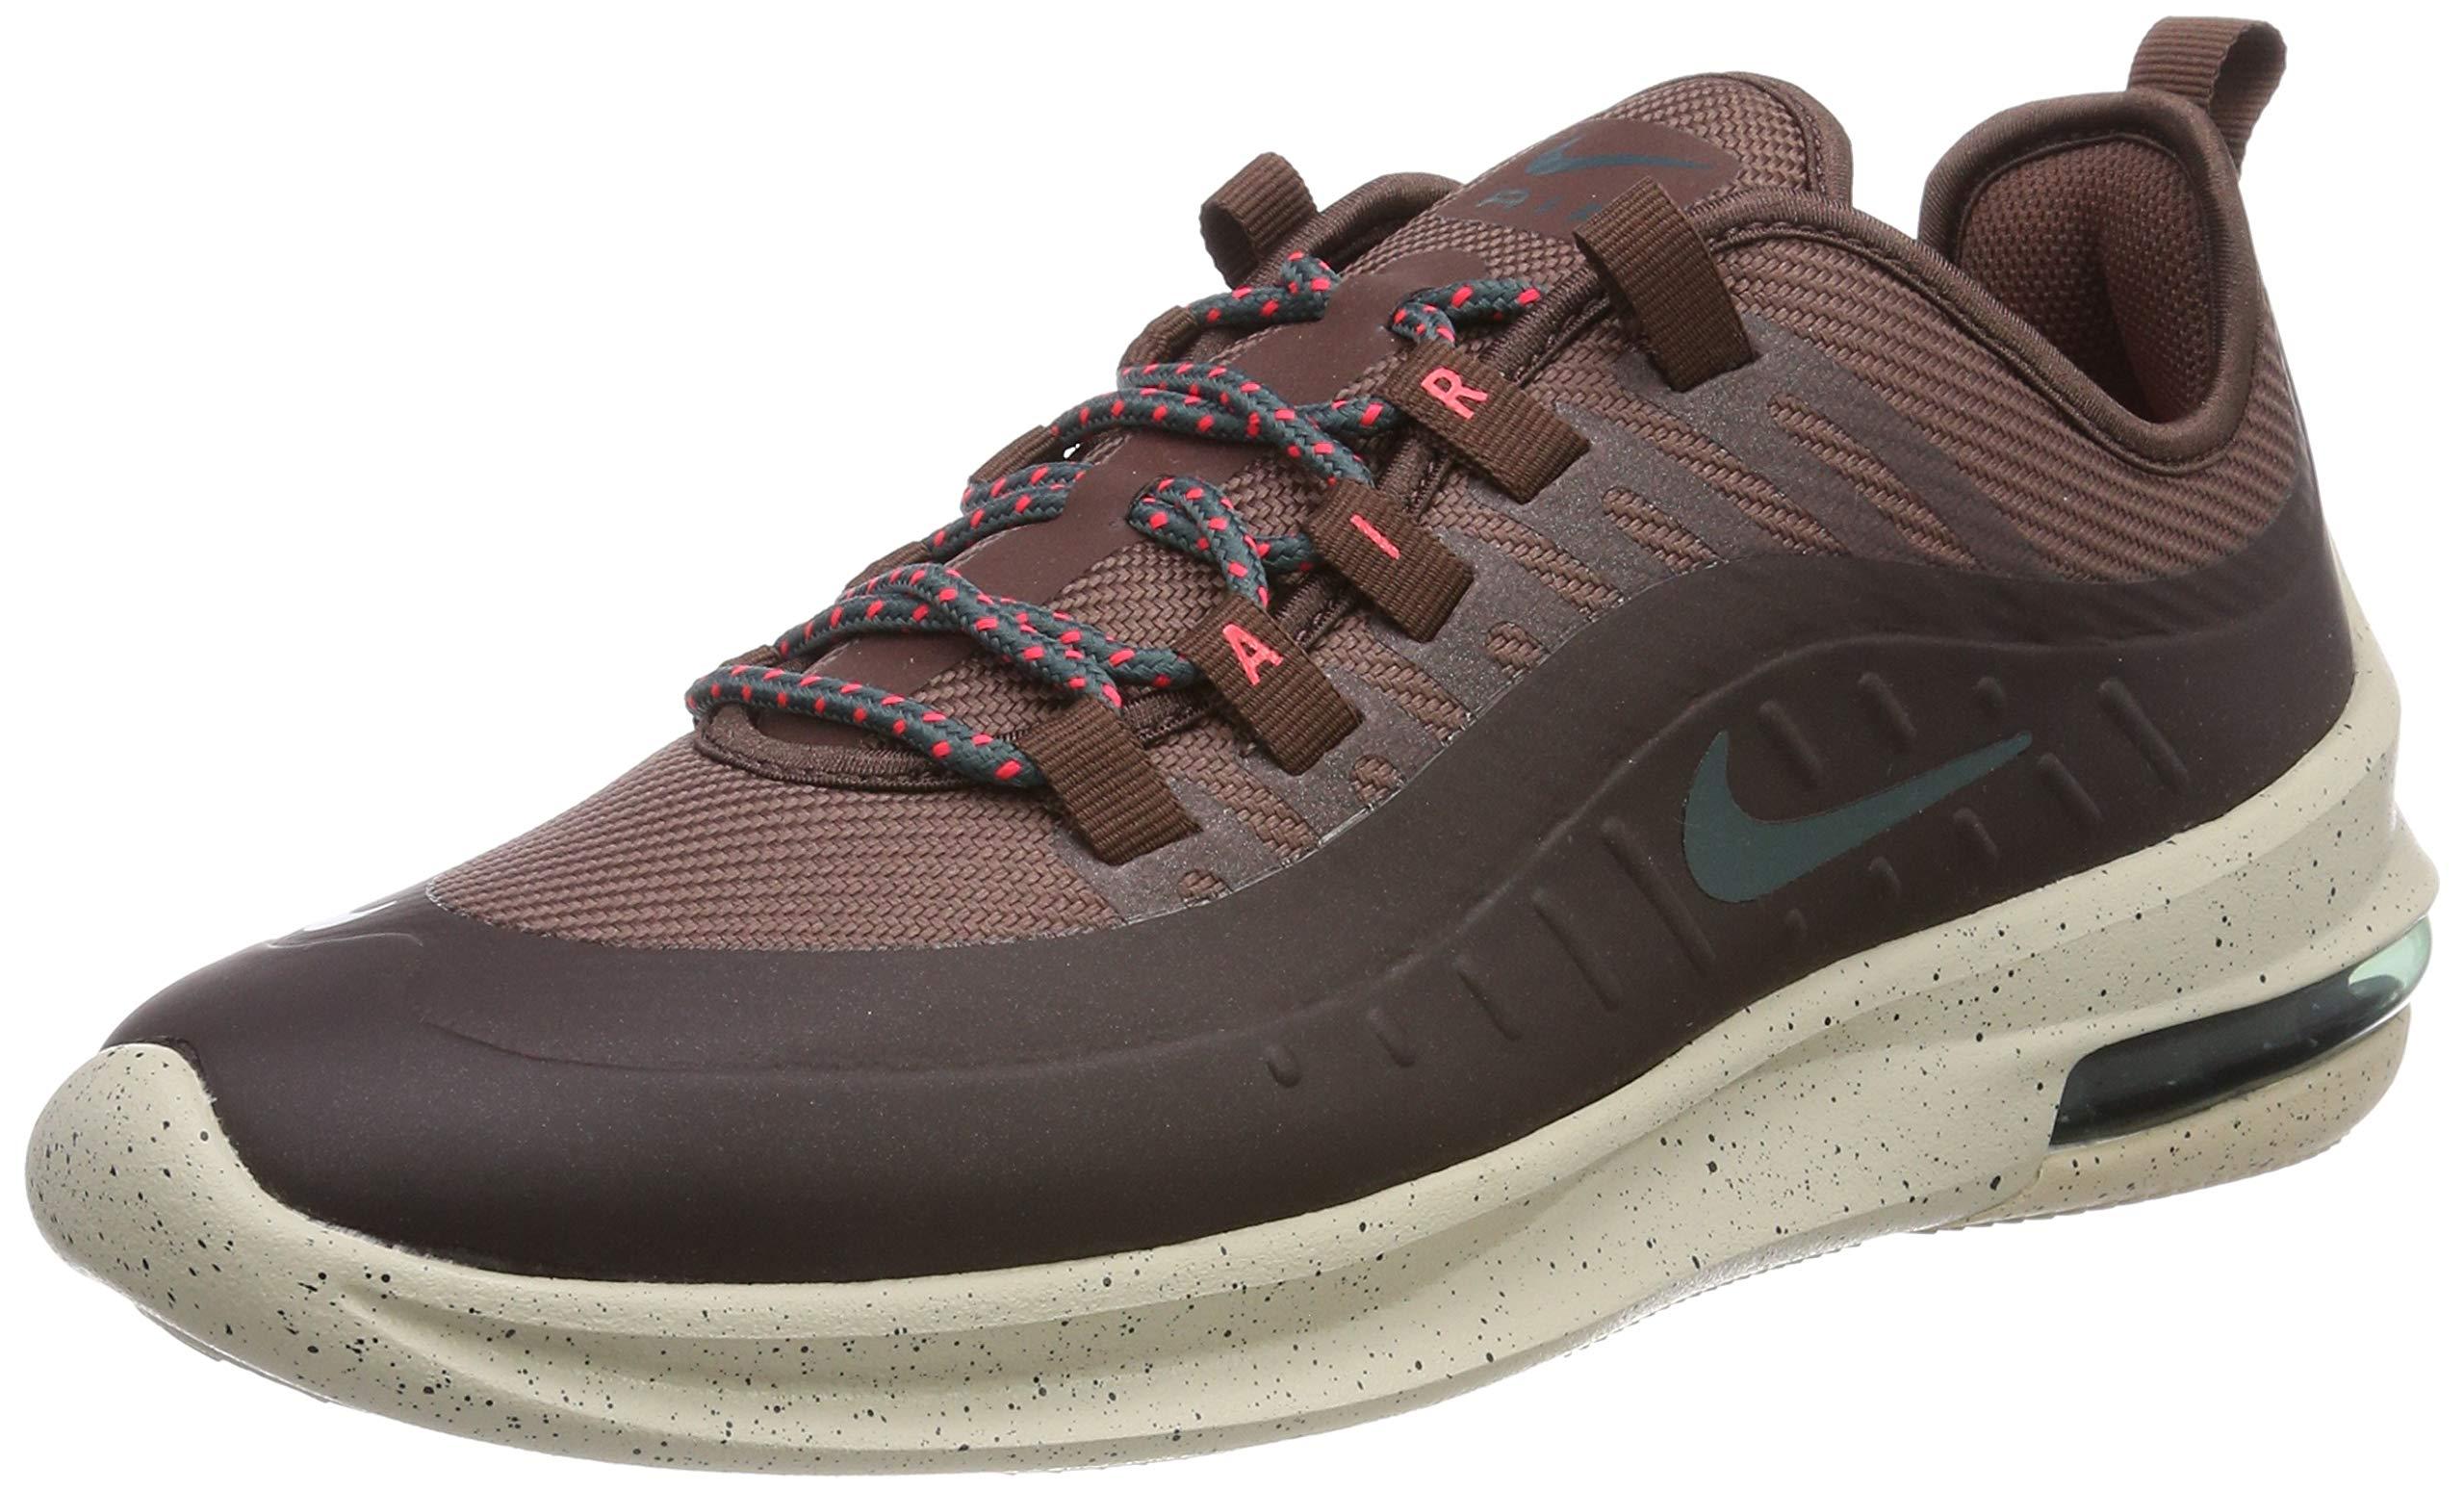 the best attitude 69917 f8feb Galleon - Nike Men s Air Max Axis Premium Running Shoe, Mahogany Mink Faded  Spruce-Burgundy Ash, 9.5